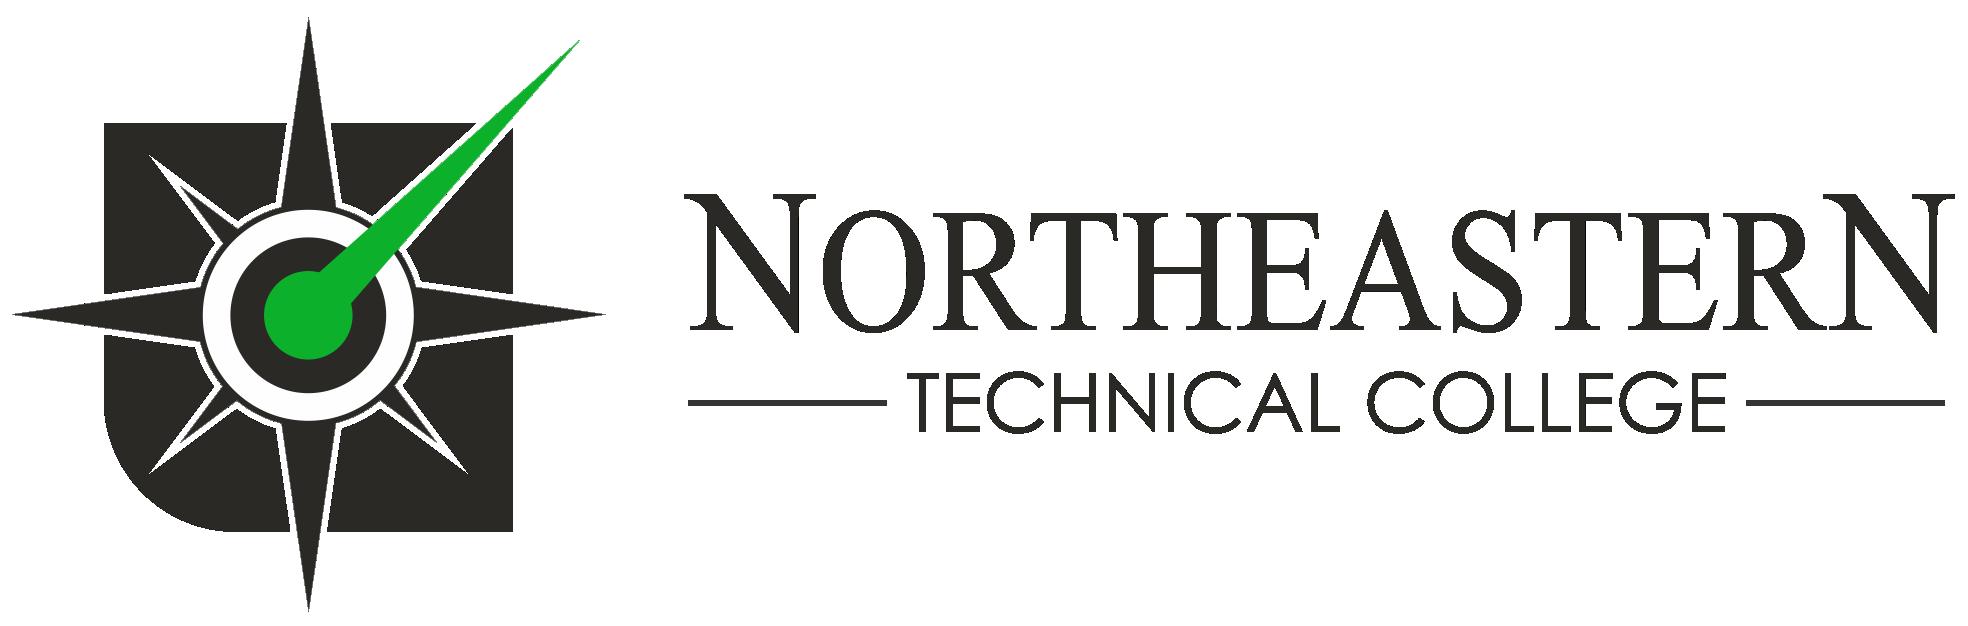 Northeastern Technical College Logo-1